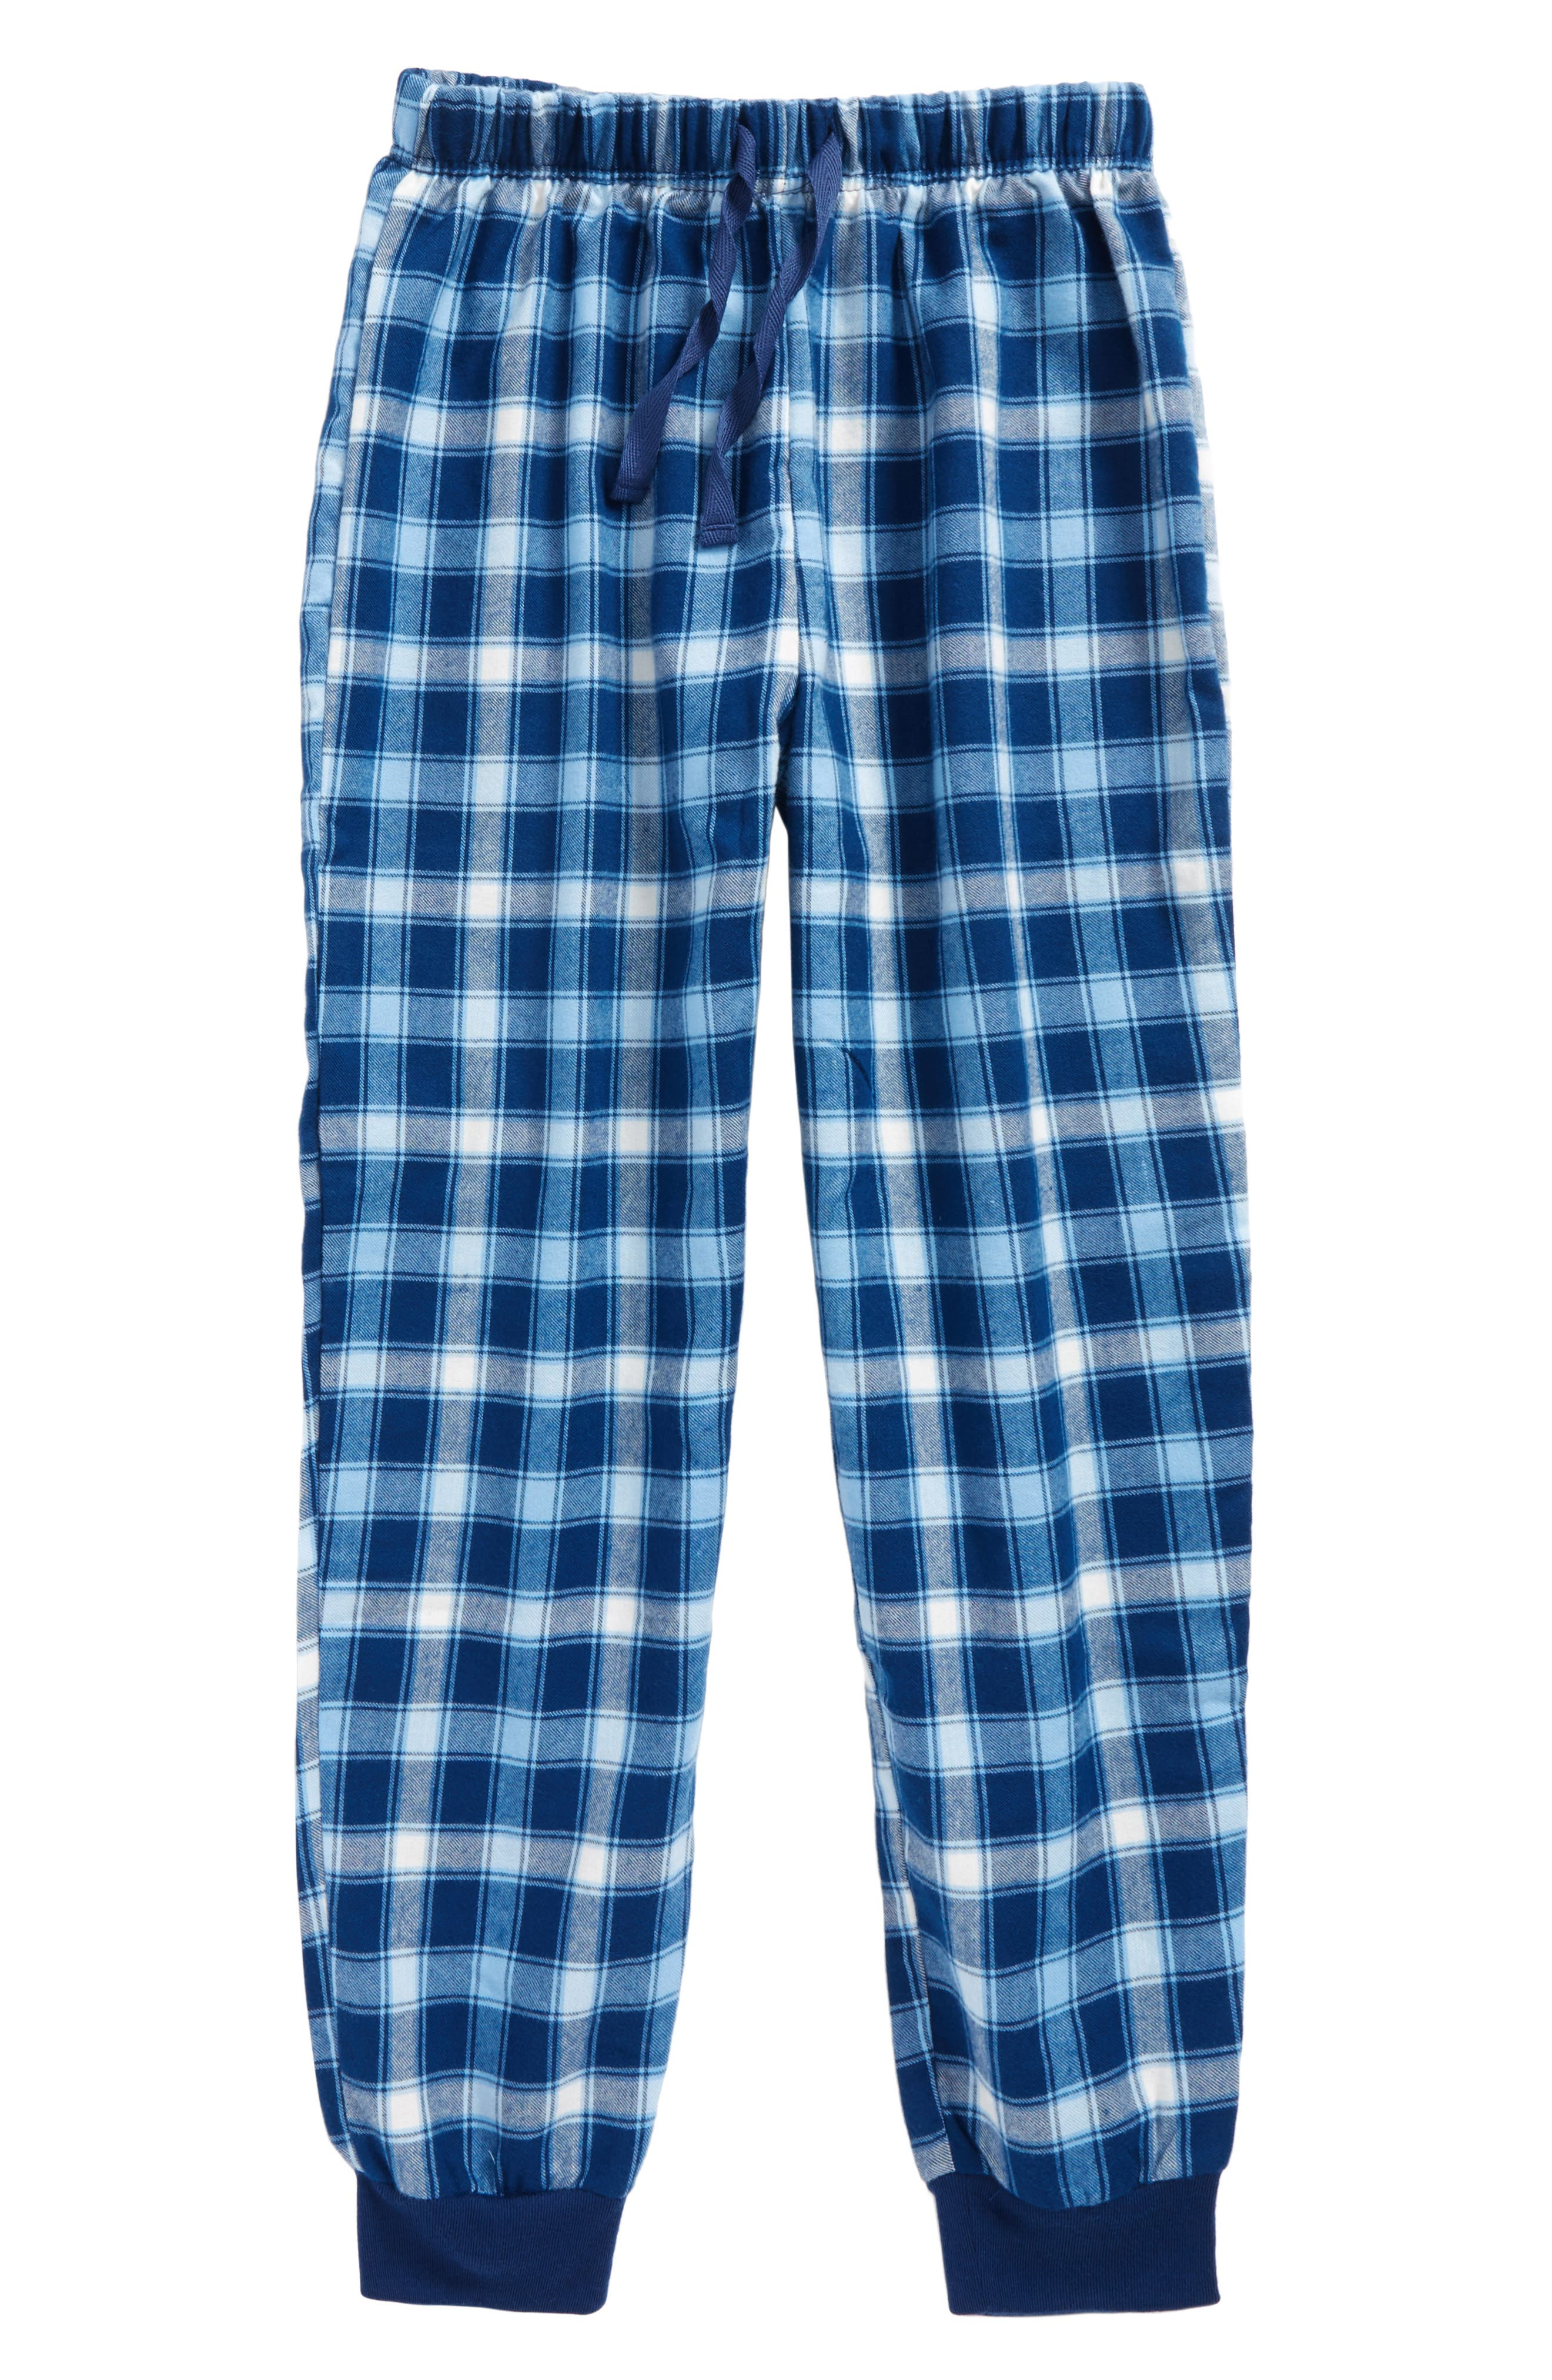 Main Image - Tucker + Tate Flannel Jogger Pants (Little Boys & Big Boys)